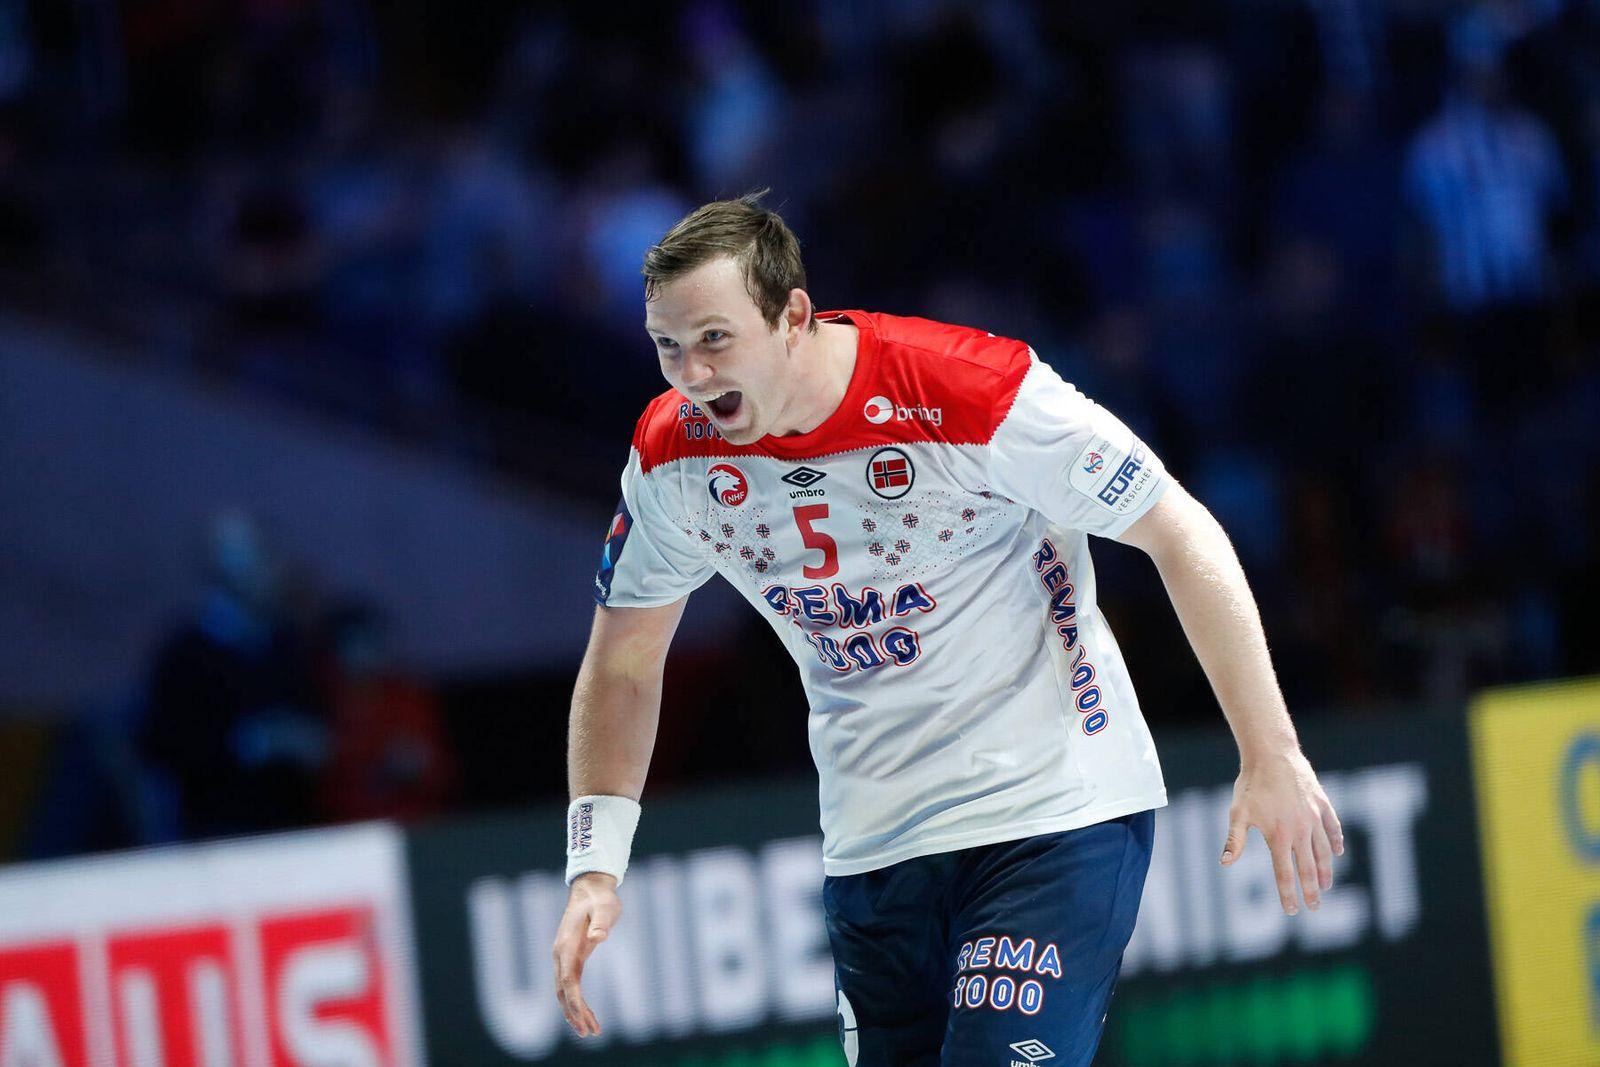 Sander Sagosen (Norvege) HANDBALL : norvege vs slovenie - ehf euro 2020 - finale 3-4 - 25/01/2020 BertrandDelhomme/Panor